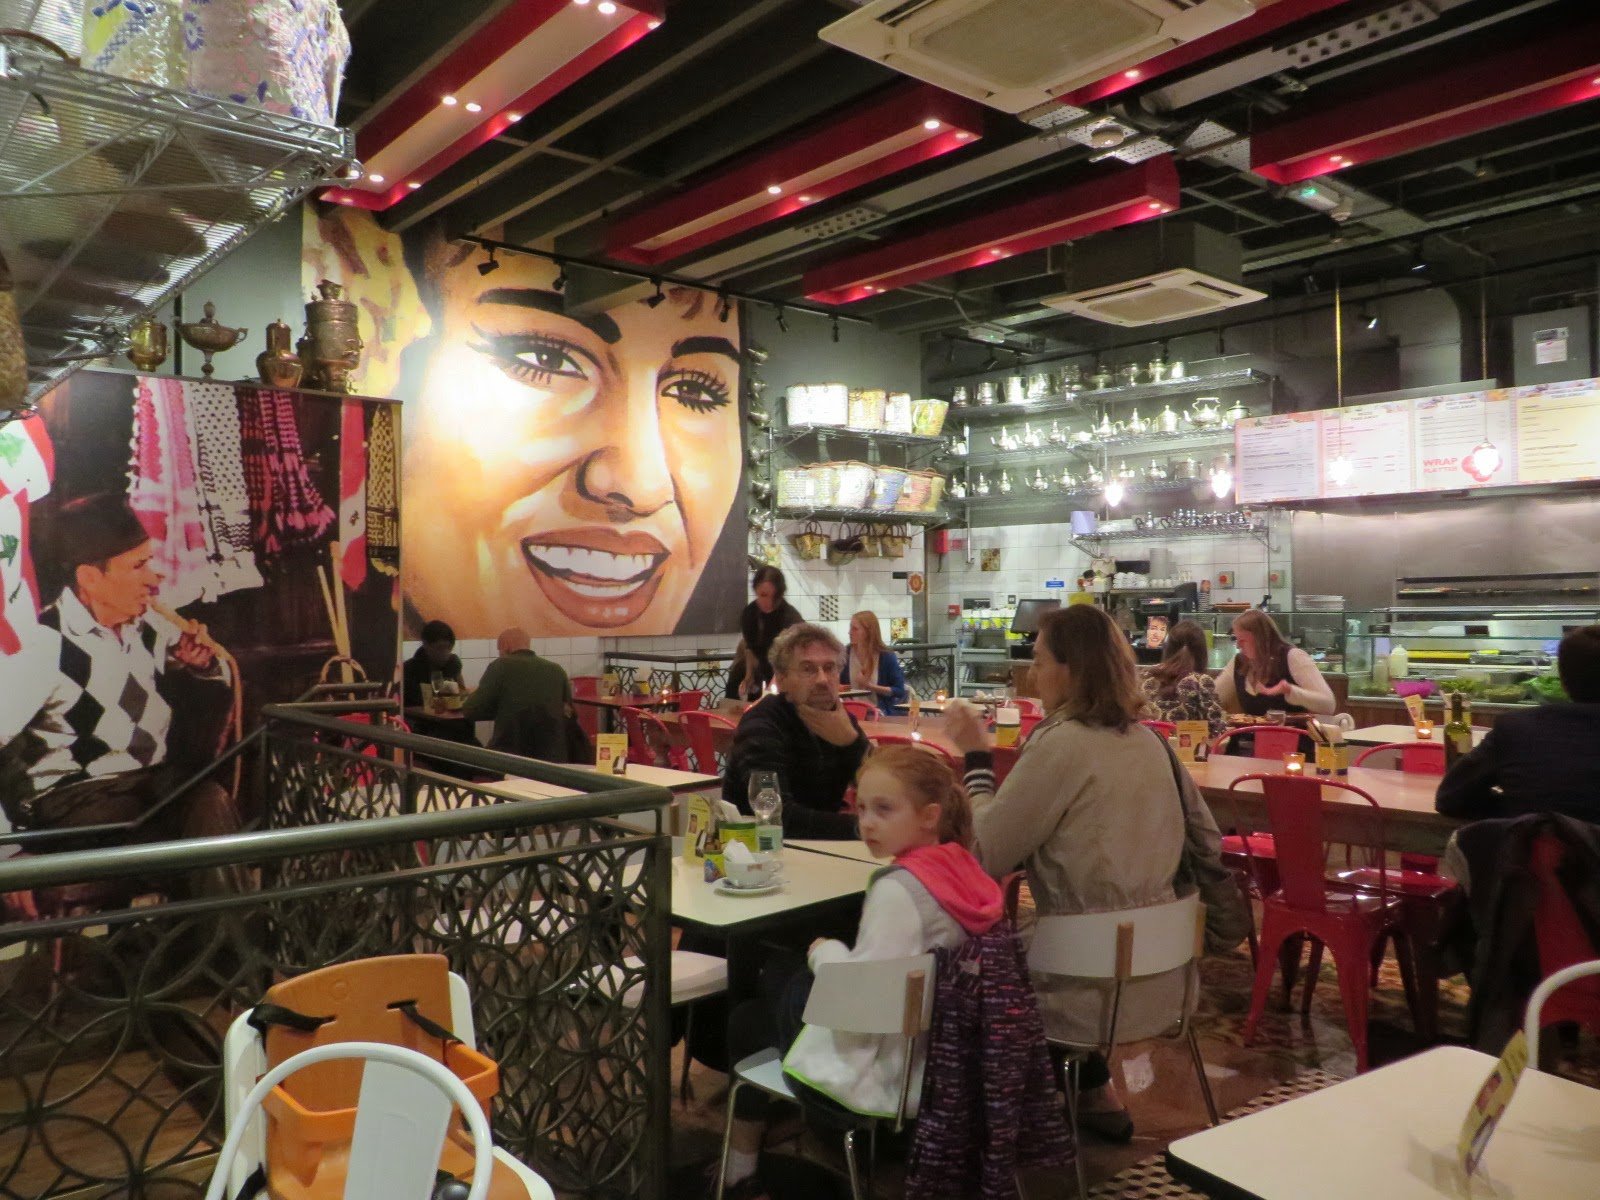 Urbina vinos blog comptoir libanais restaurant in london - Comptoir restaurant london ...